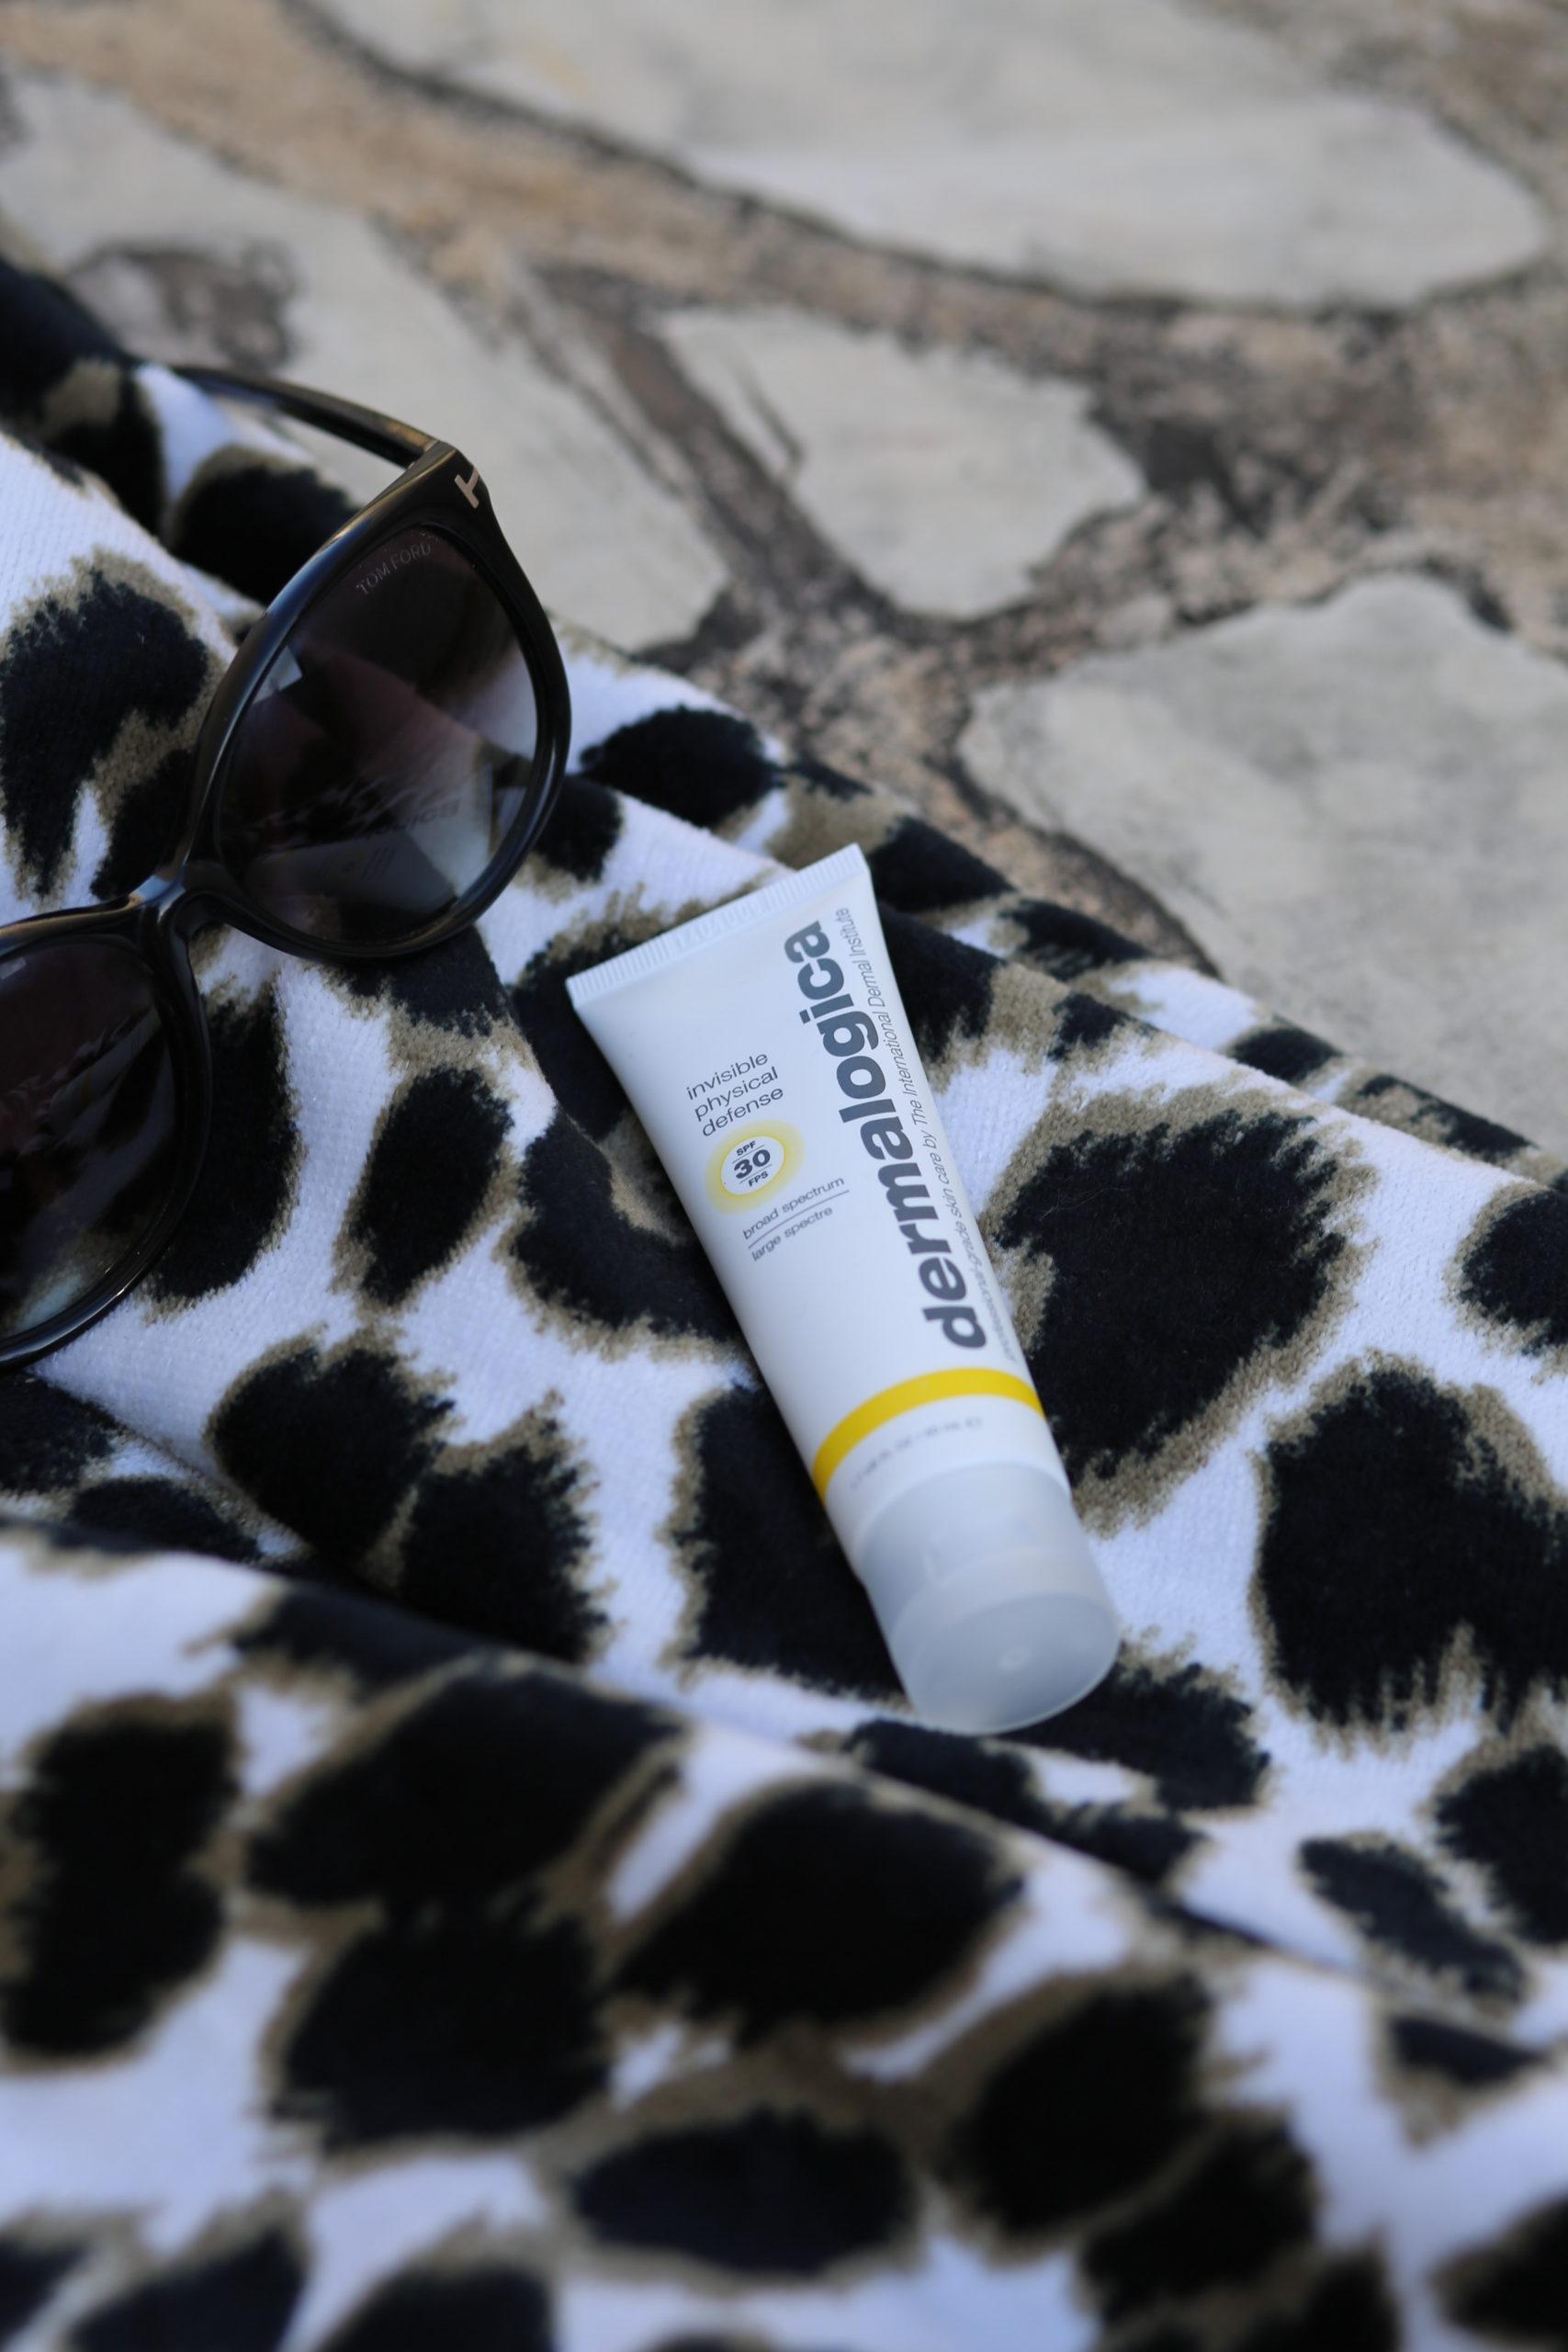 sunscreen, chemical vs. mineral sunscreen, sunblock, dermalogica